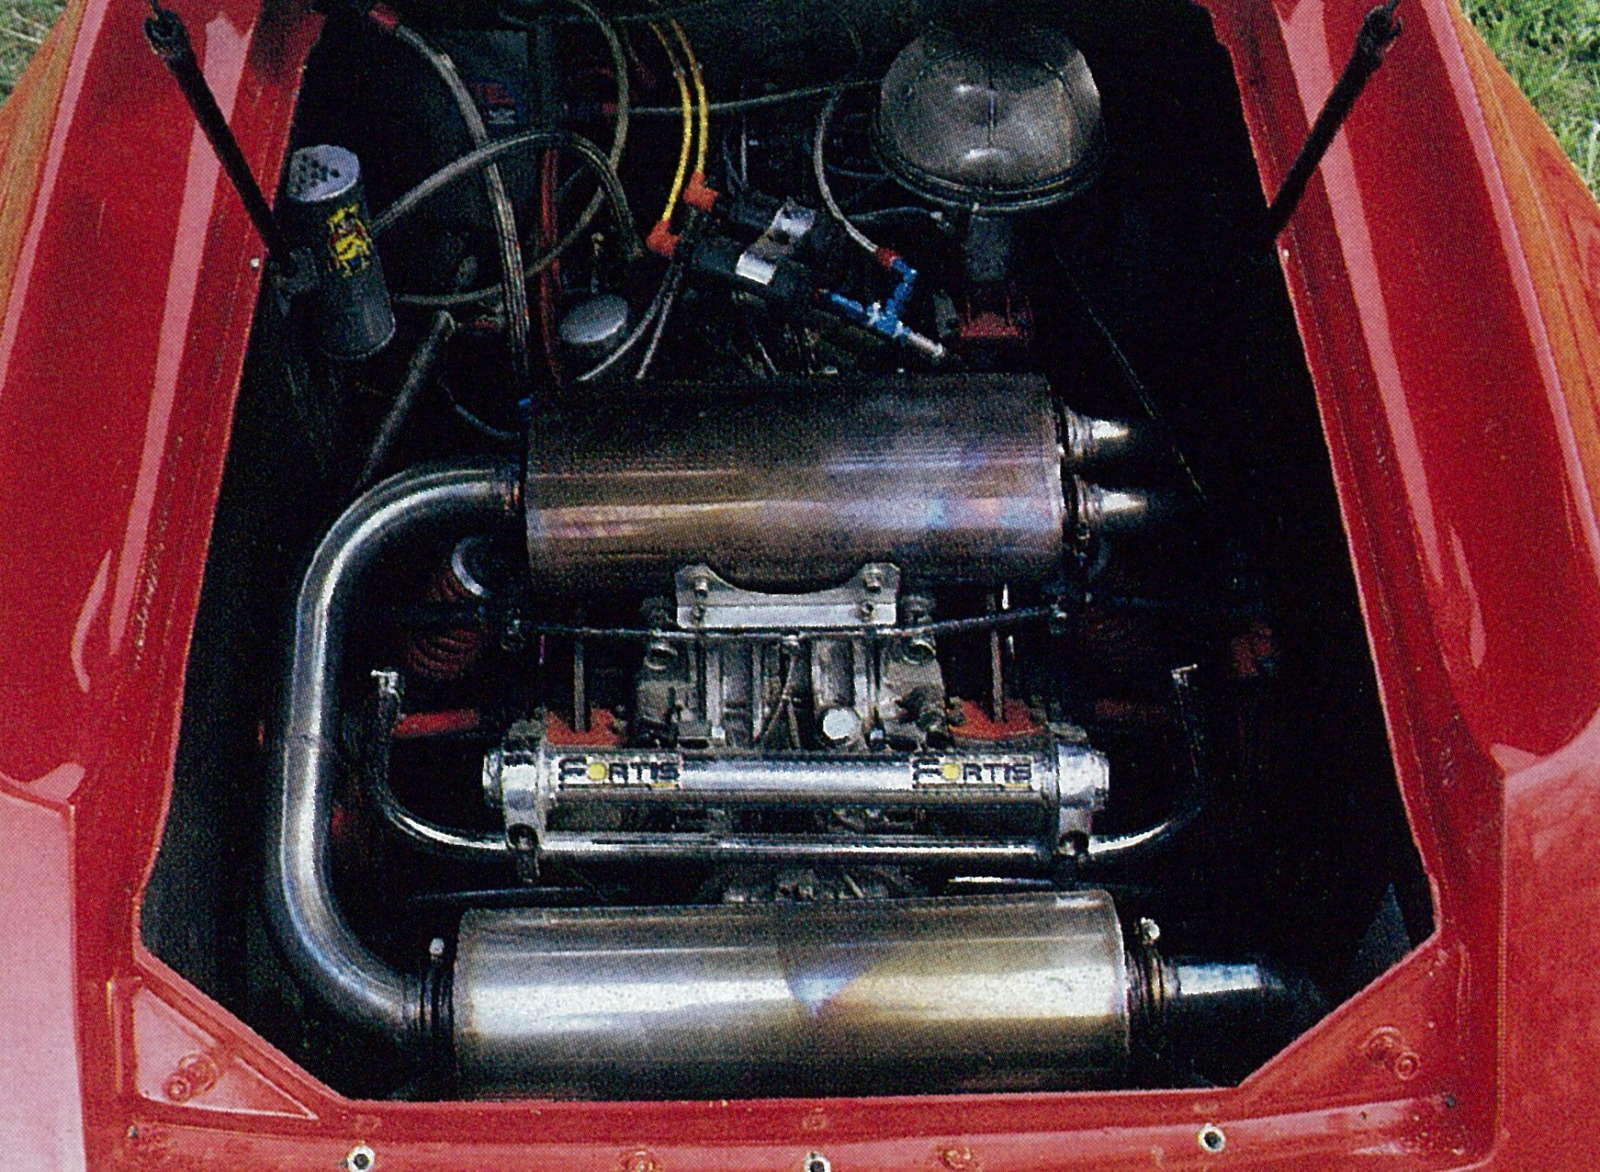 「RE雨宮ロータスヨーロッパ改13Bペリは、今見ても異次元のスーパーマシン【OPTION 1987年7月号より】」の1枚目の画像